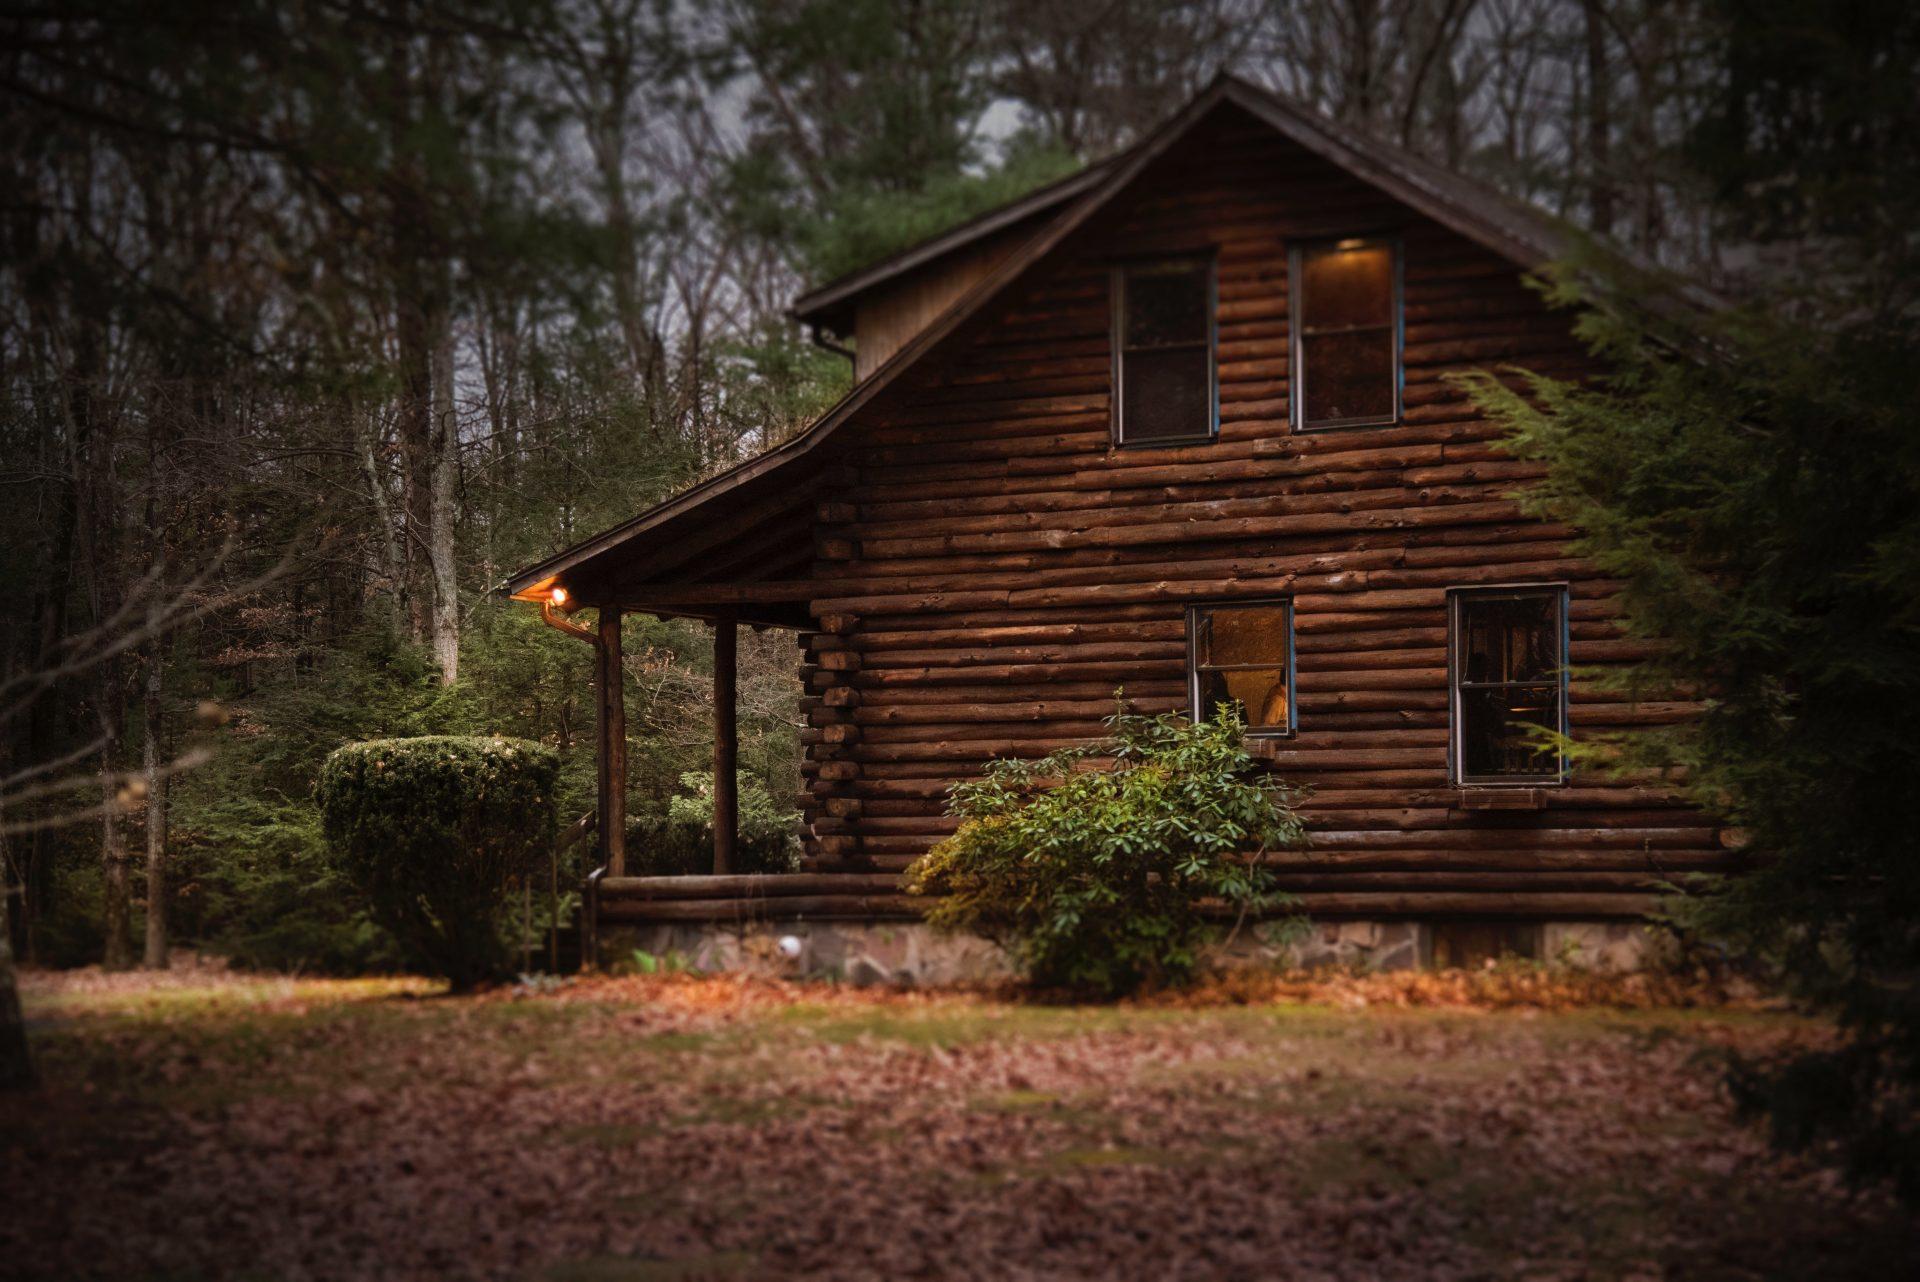 drevodom-dreveny-dom-les-stromy-listy-kriky-priroda